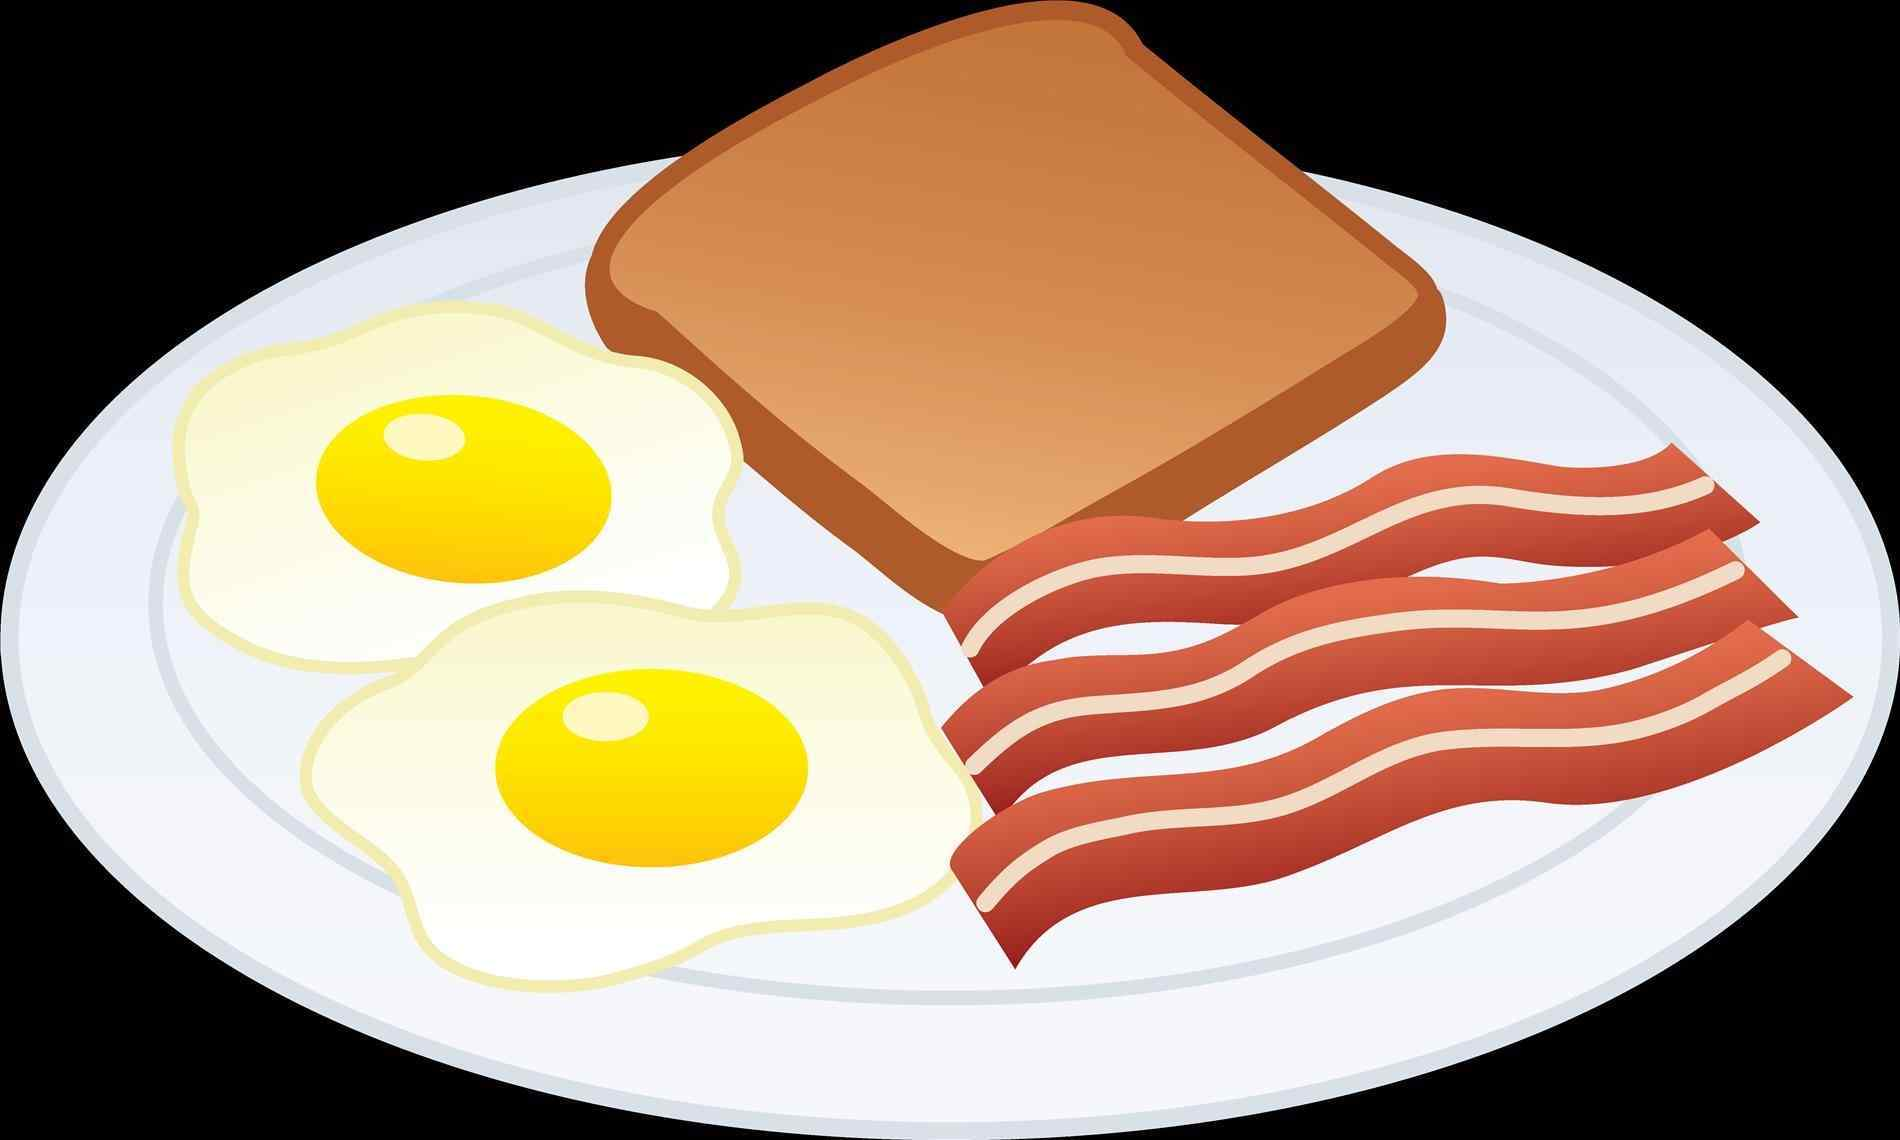 1900x1140 Breakfast Breakfast Food Pictures Cartoons Clipart Cartoon Pencil